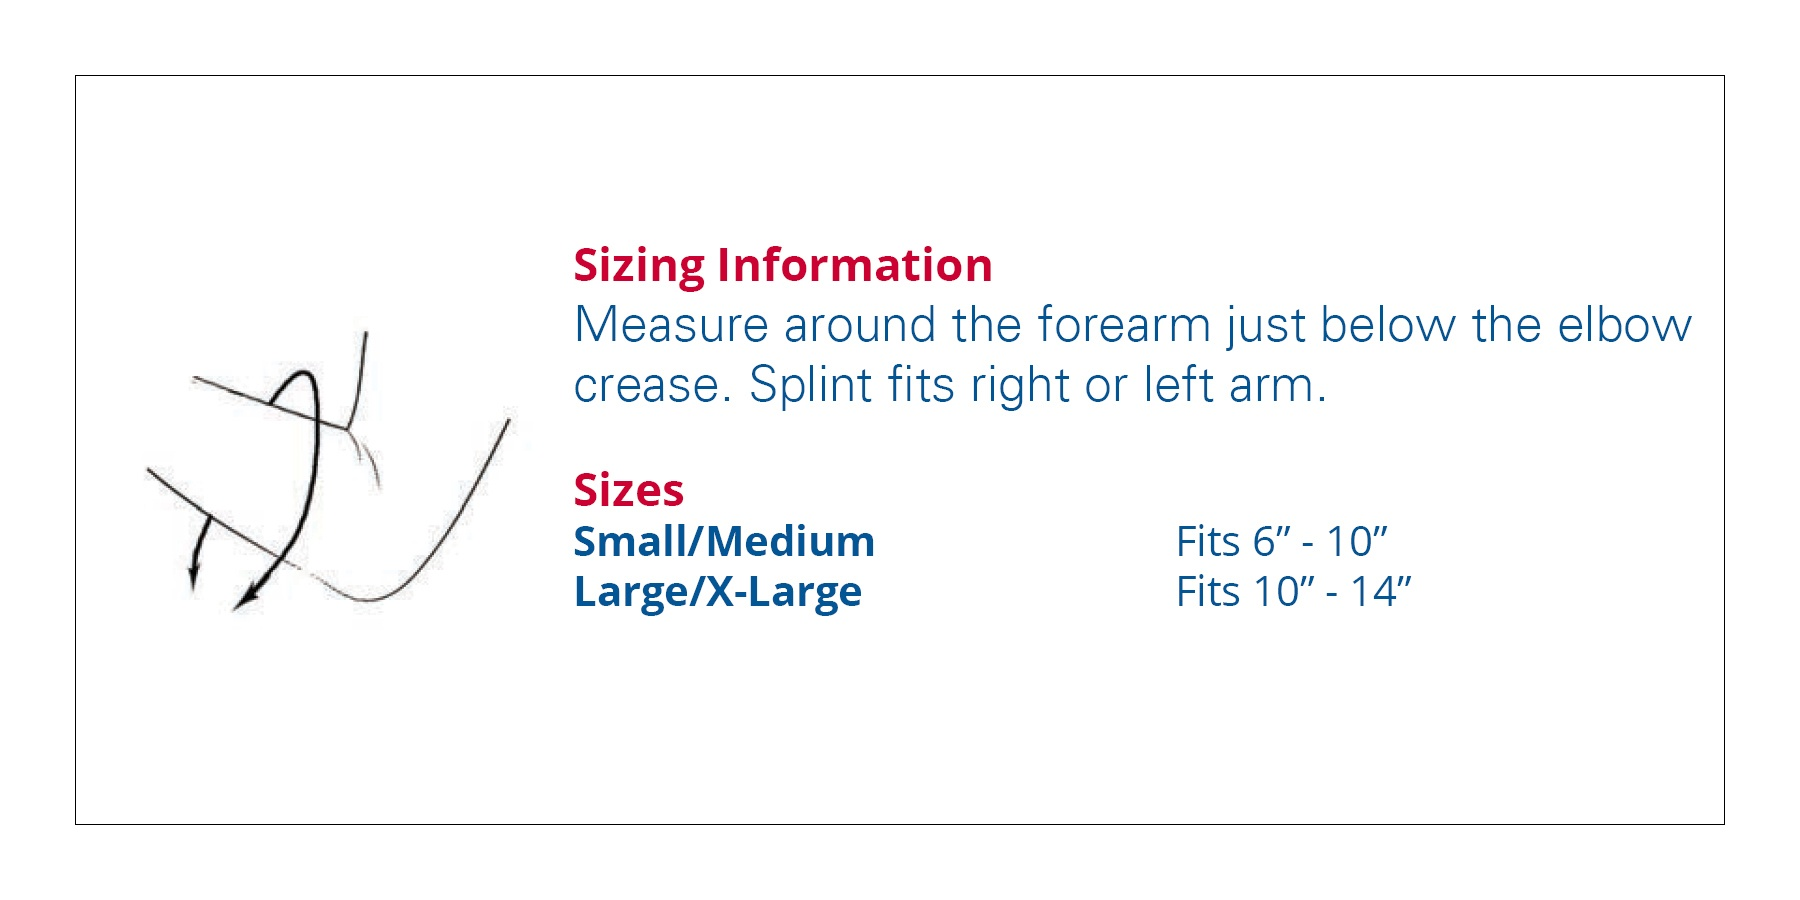 3pp Elbow P.O.P. Splint size information